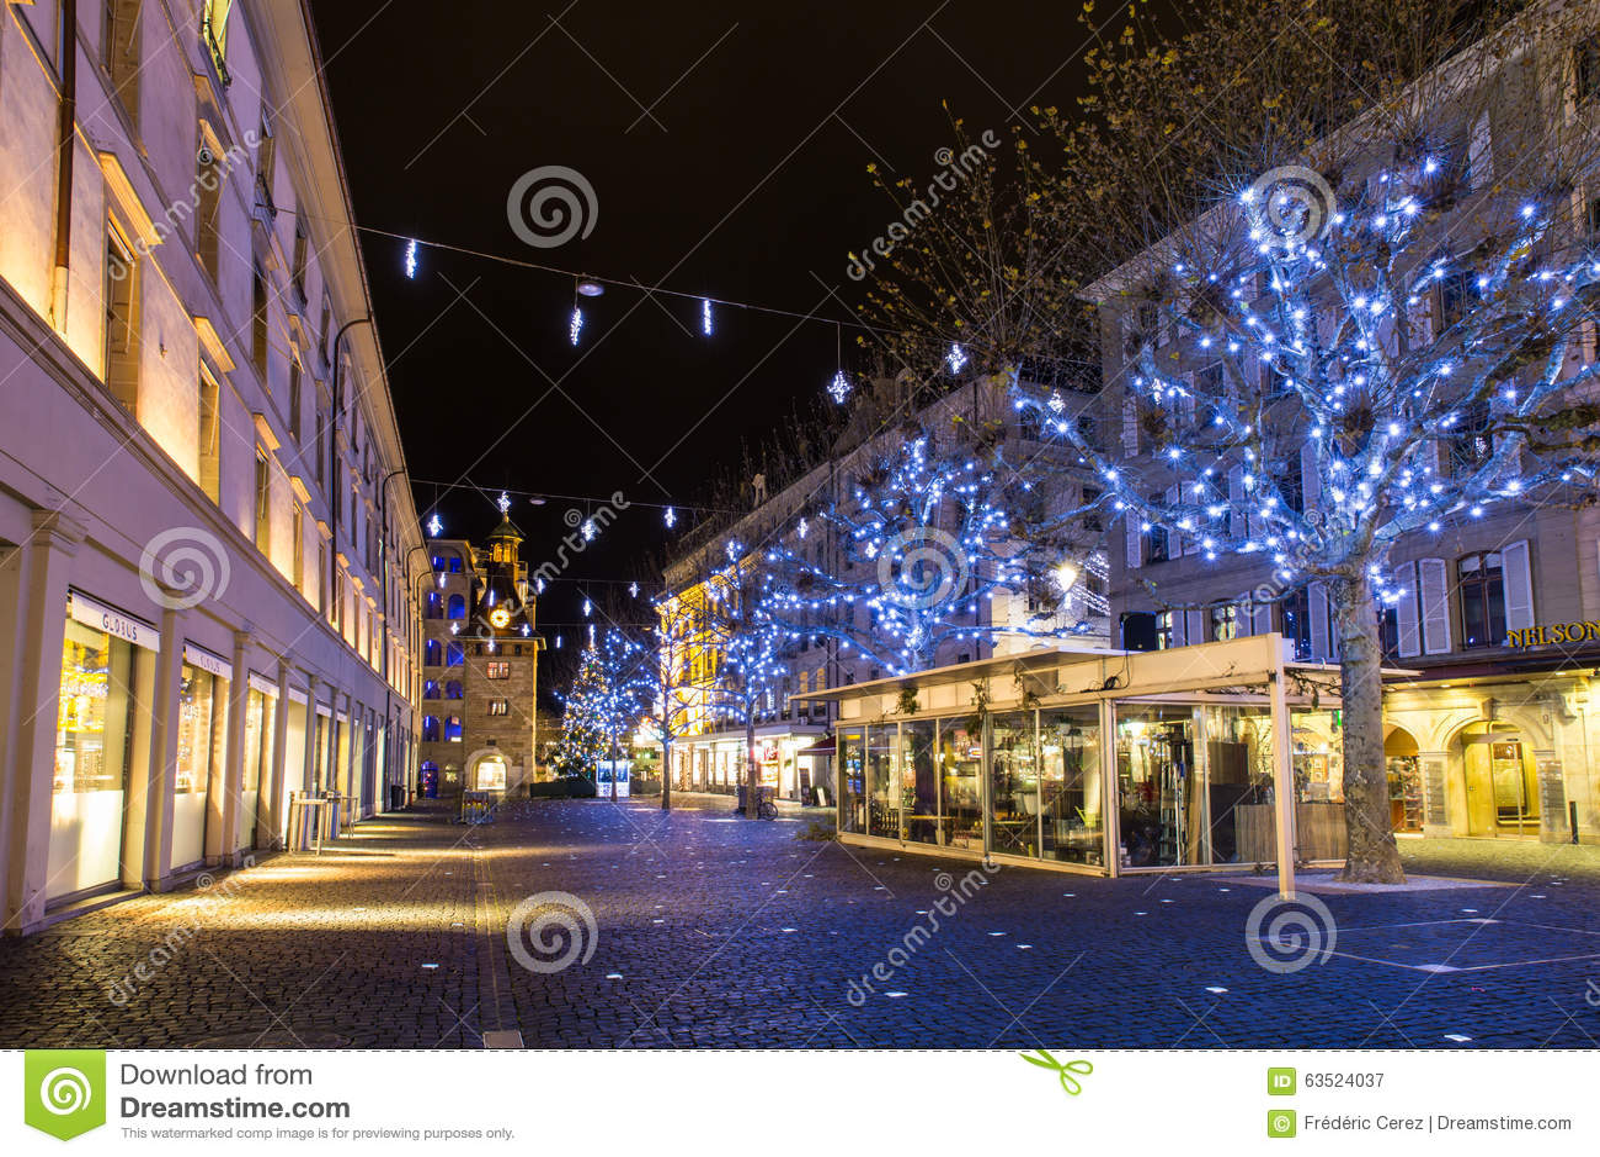 #A97C22 Molard Square At Night During Christmas Season Editorial  5545 decorations noel geneve 1300x957 px @ aertt.com